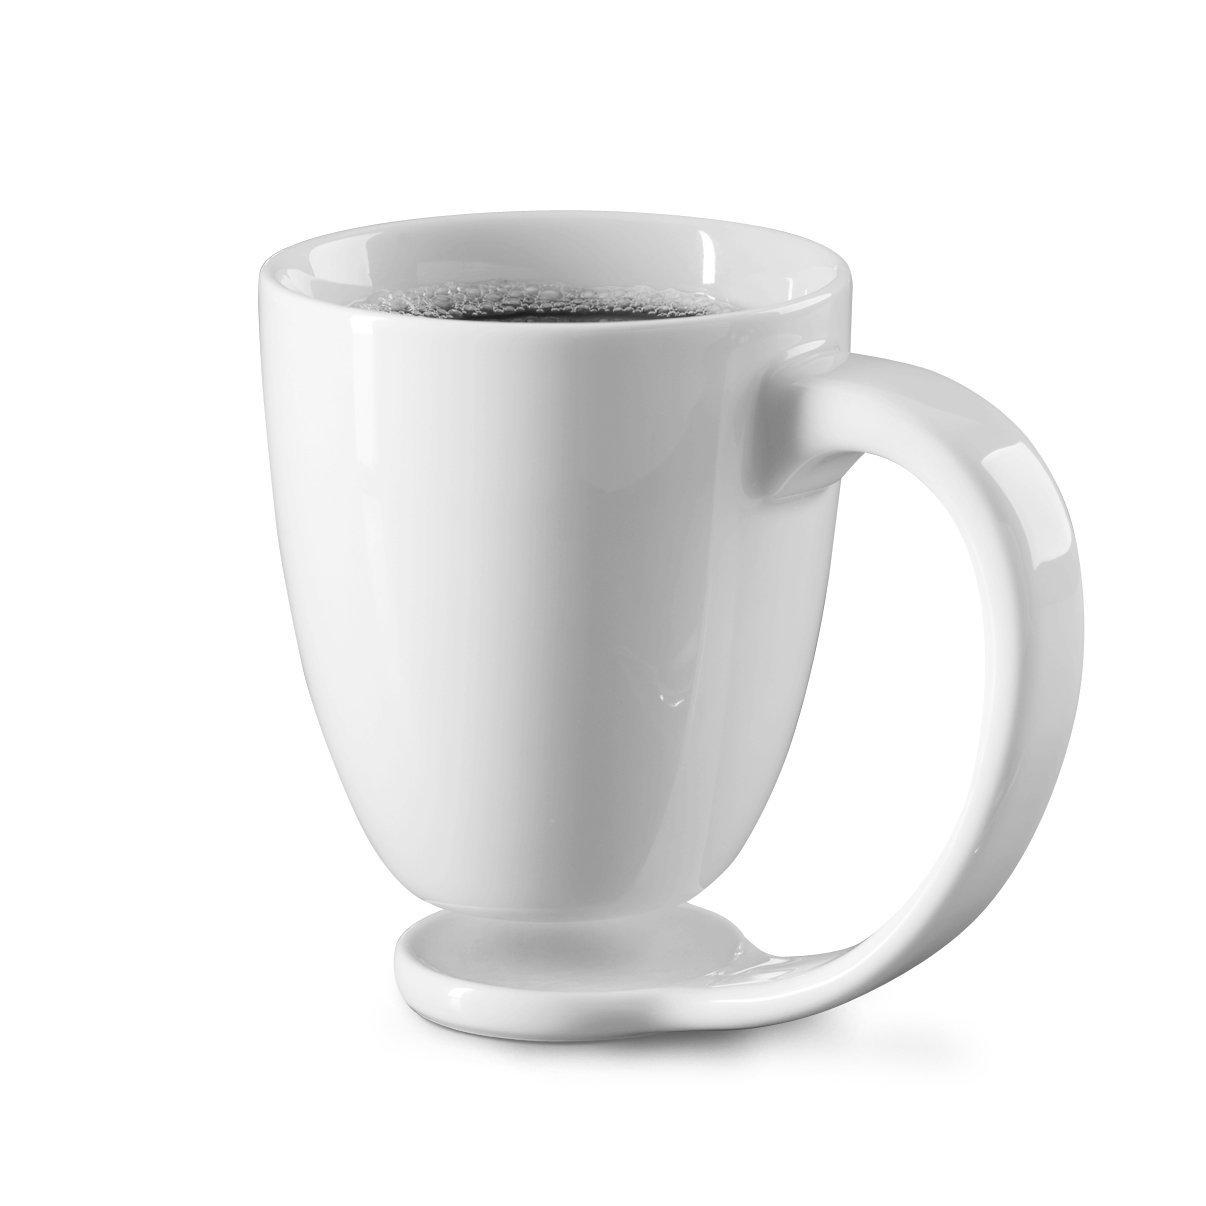 a14788e11ec FLOATING MUG Plain White Porcelain Mug and Handle Best Gift Ideas ...